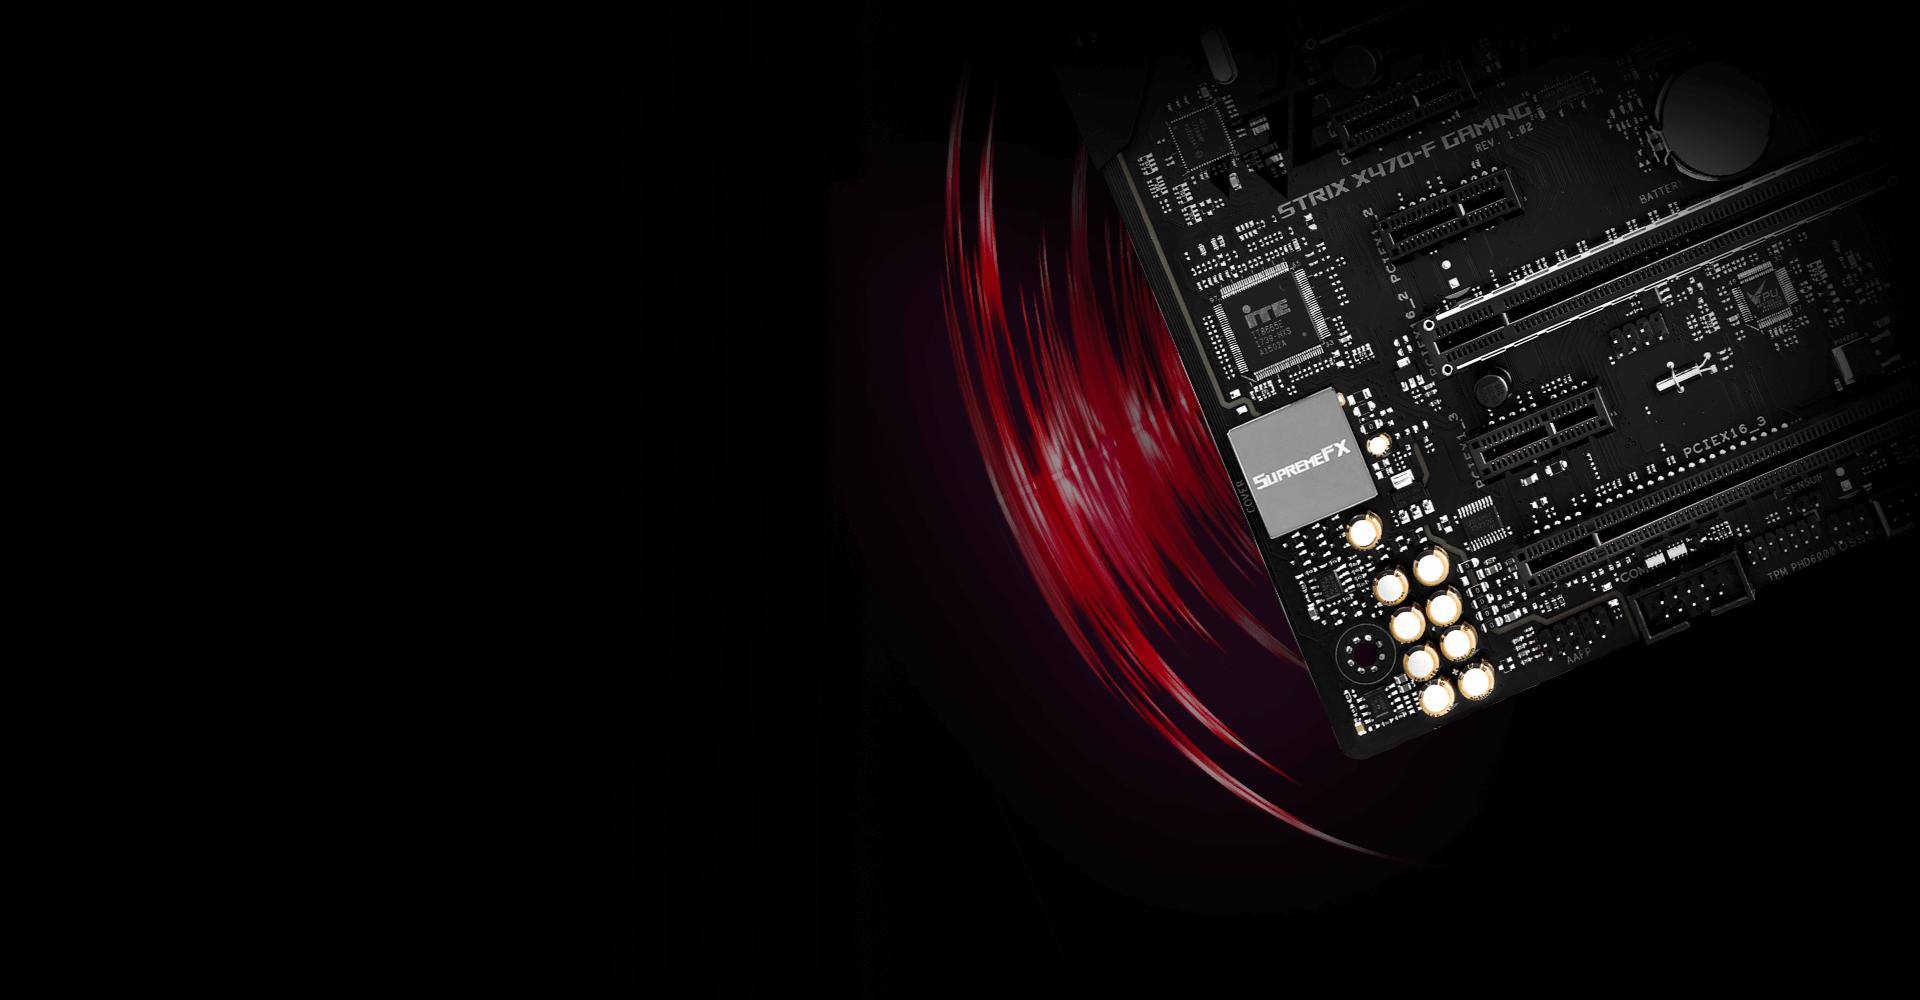 ASUS ROG STRIX X470-F GAMING | Gaming Motherboard | ASUS USA